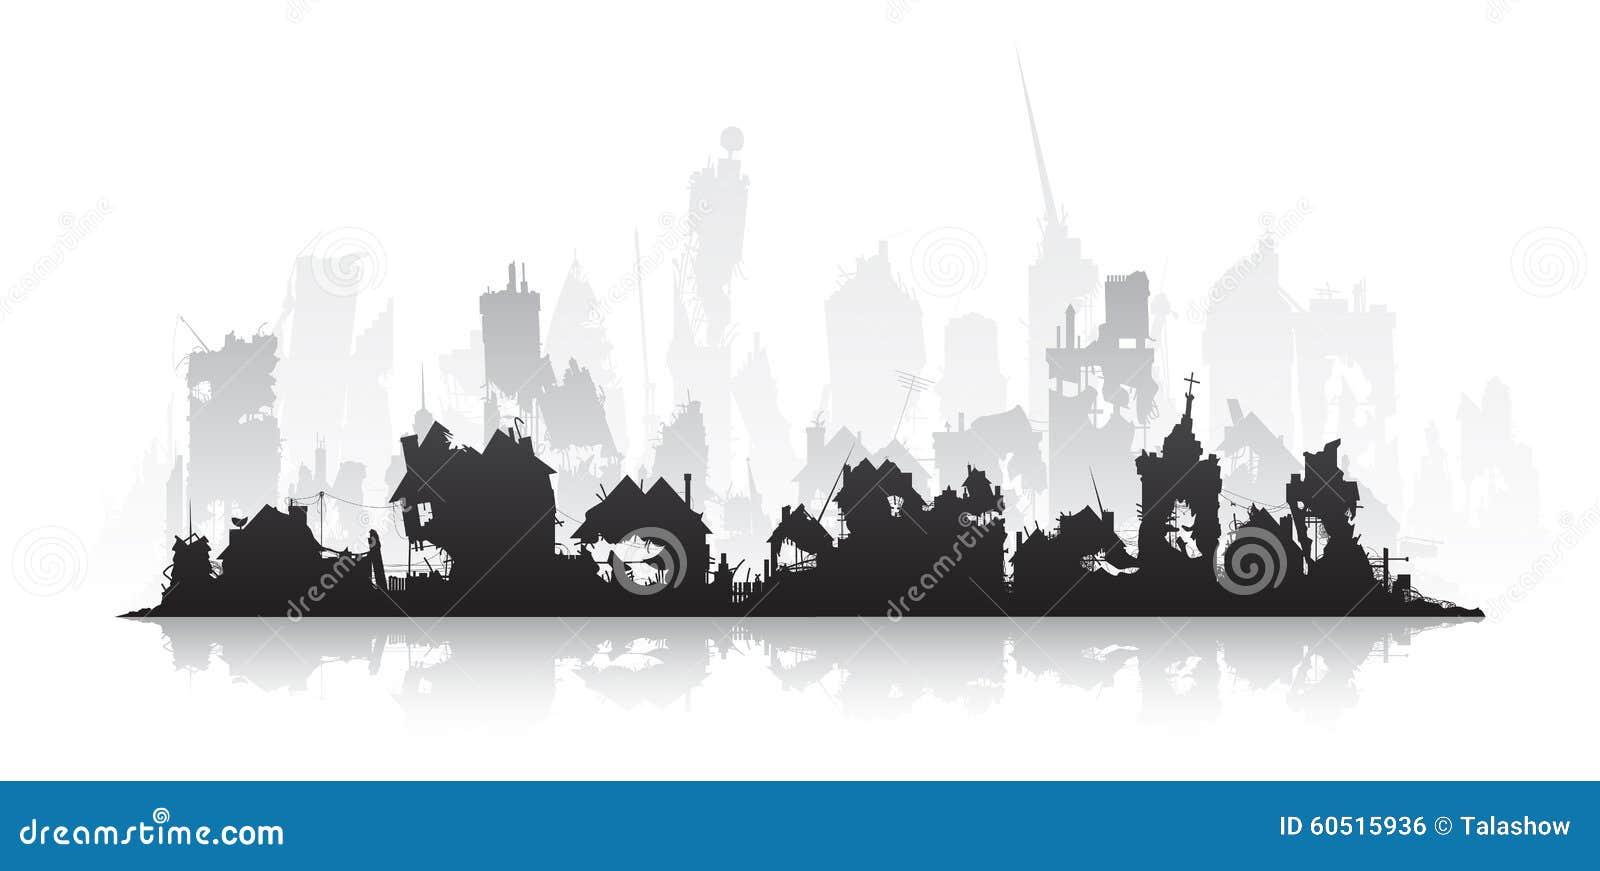 Ghost town stock vector. Illustration of halloween, city ...